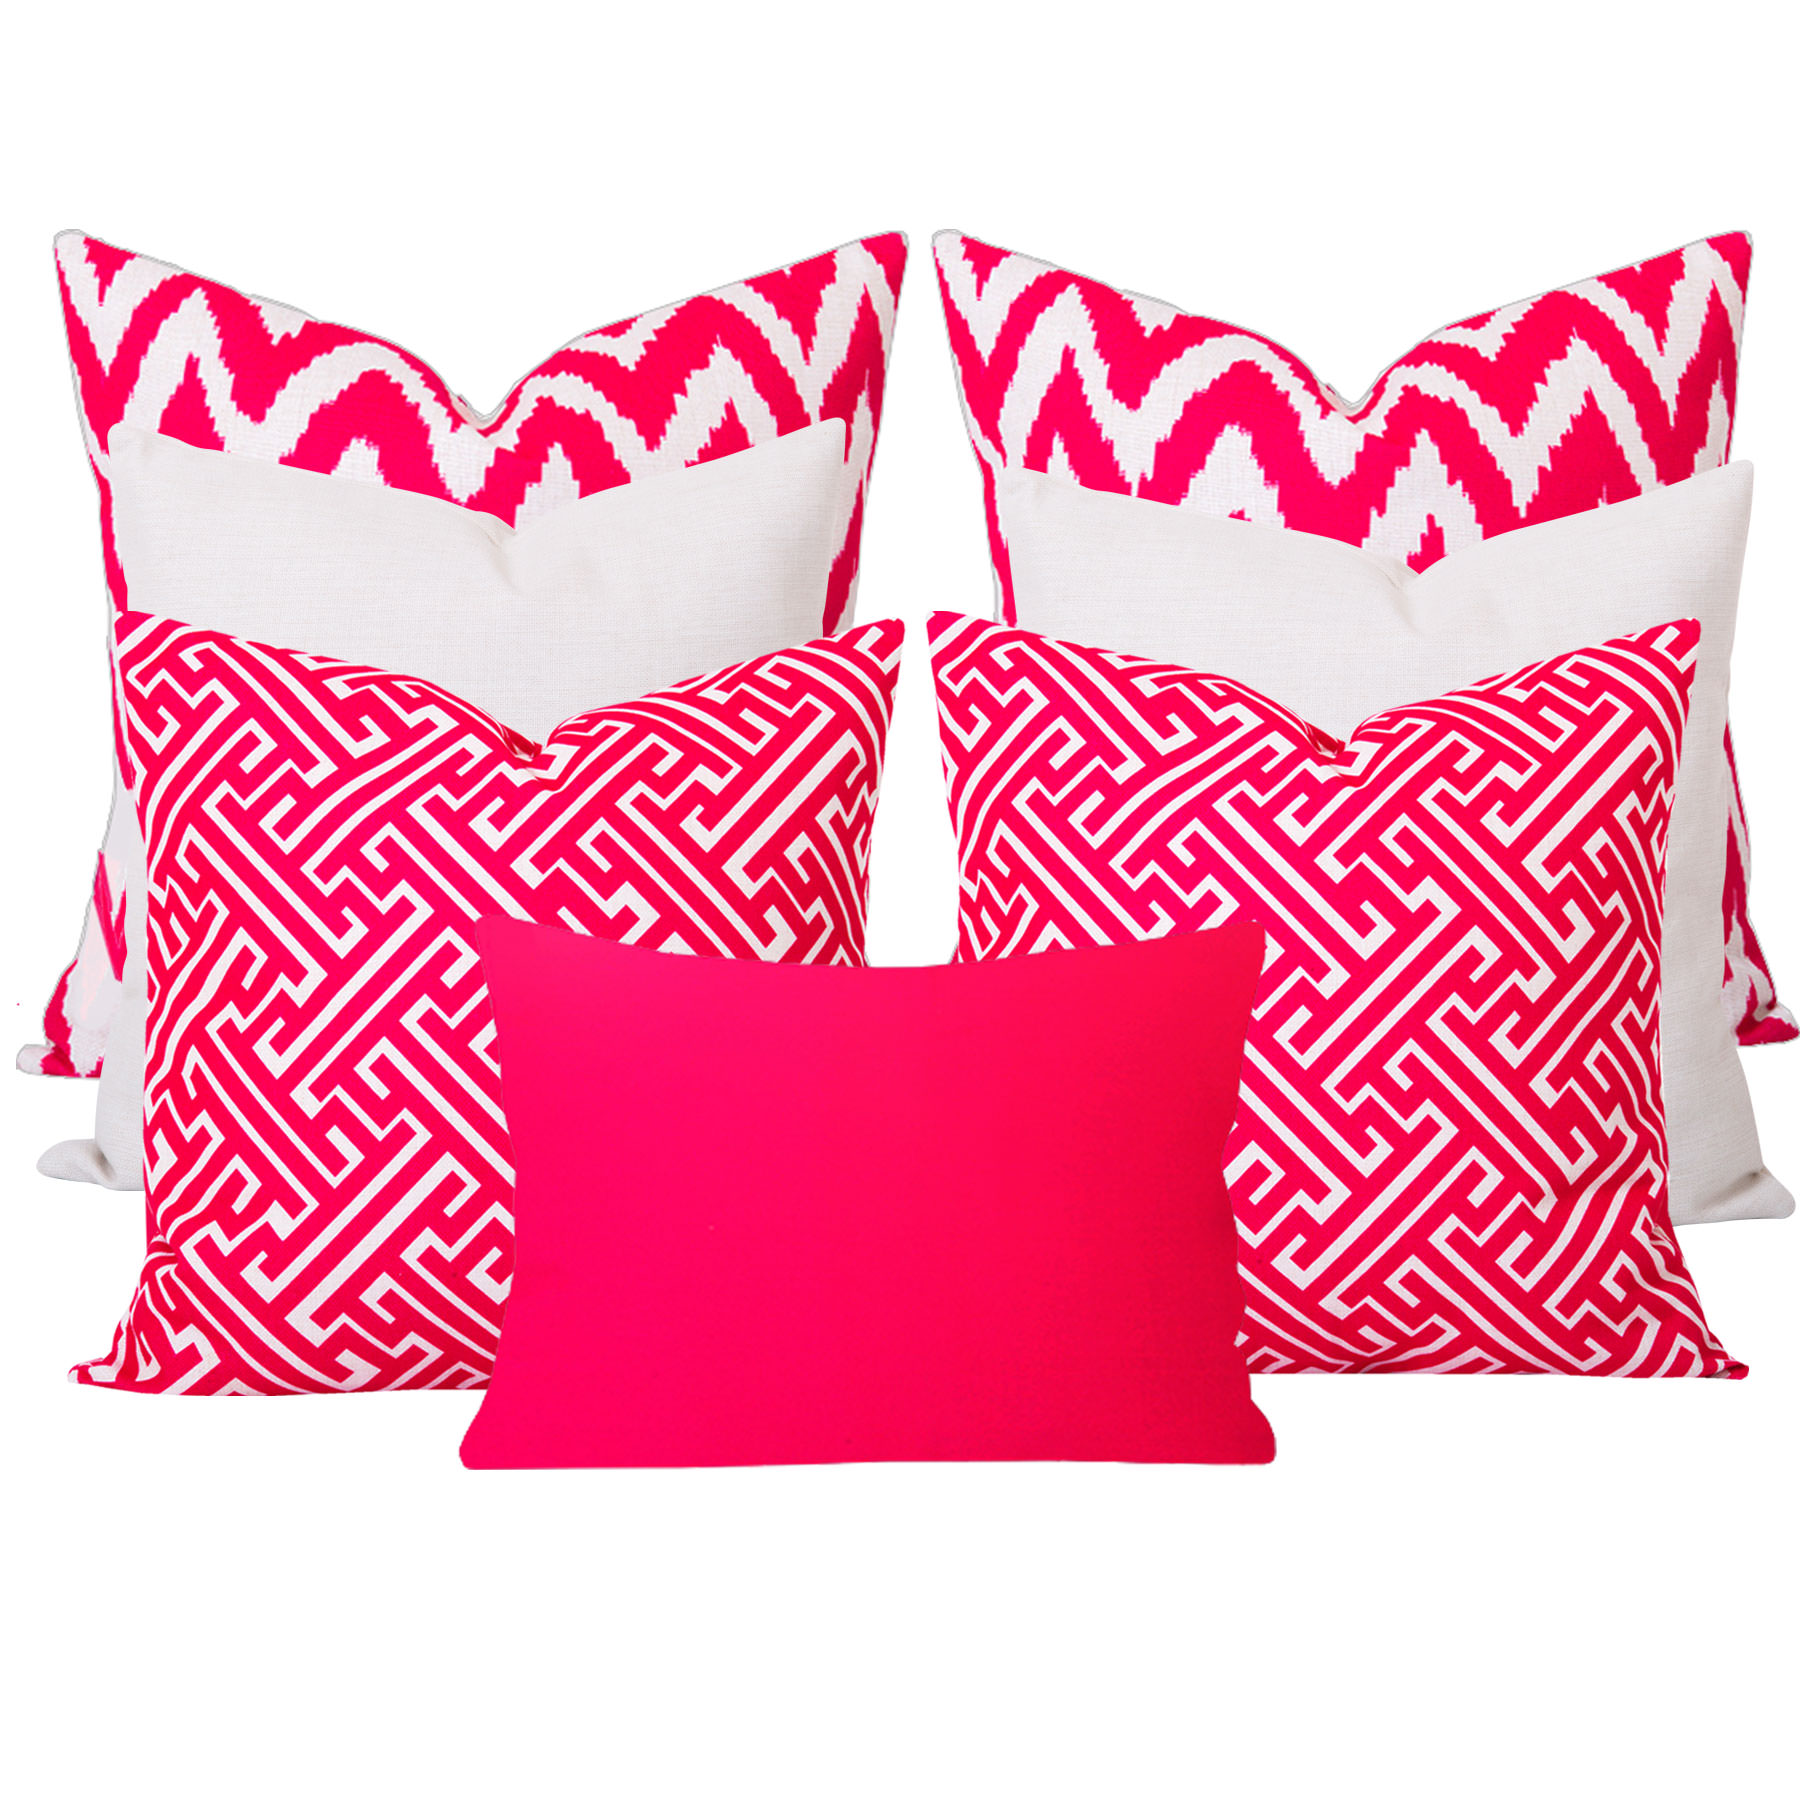 Gaia-Maze-Pink-7-Cushion-Set